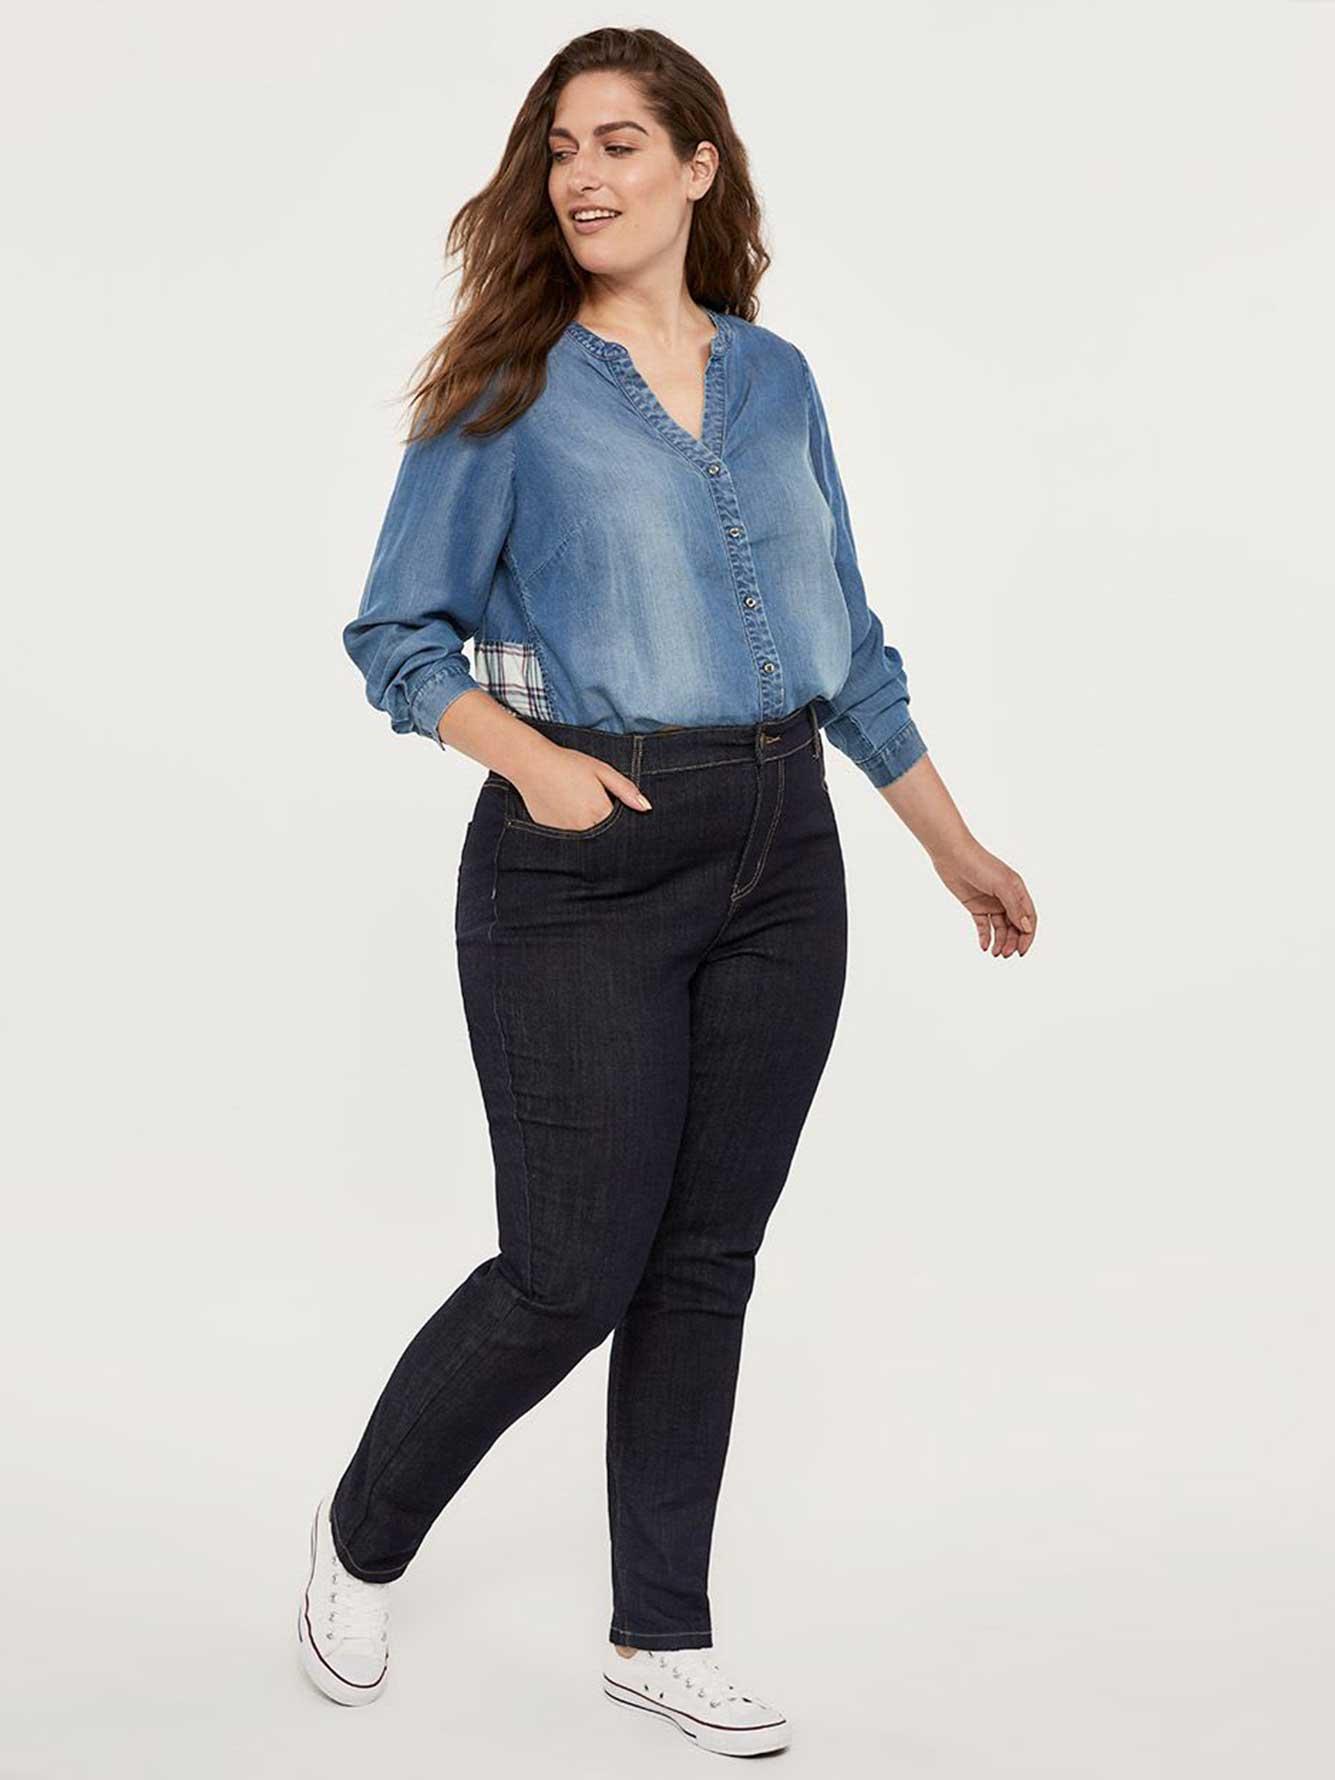 ef8b566048f ONLINE ONLY- Tall Curvy Fit Straight Leg Jean - d C JEANS ...